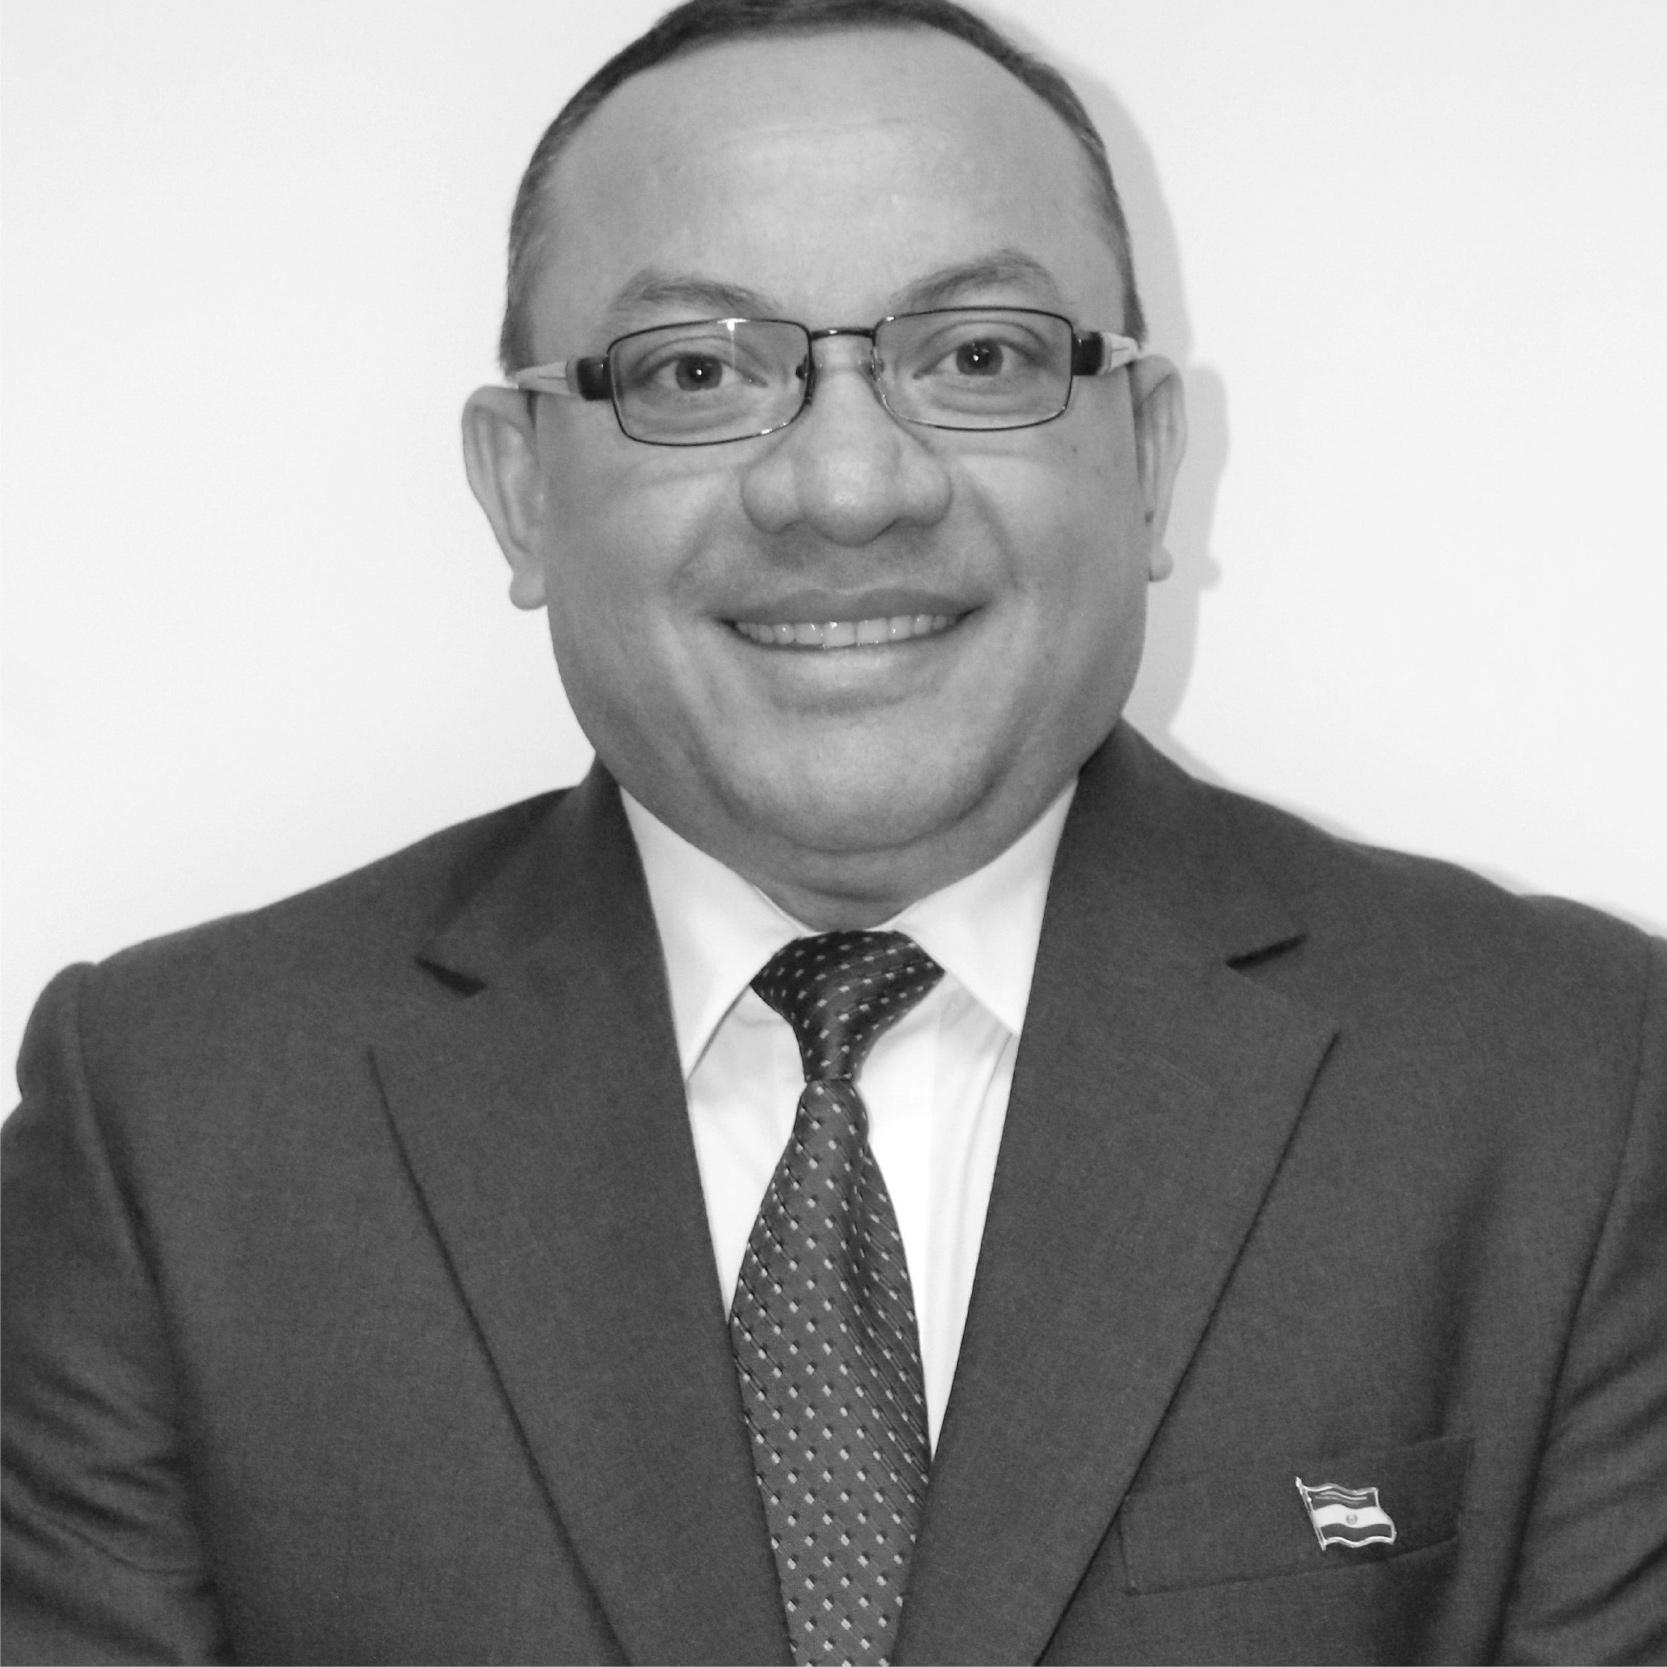 Daniel Orellana